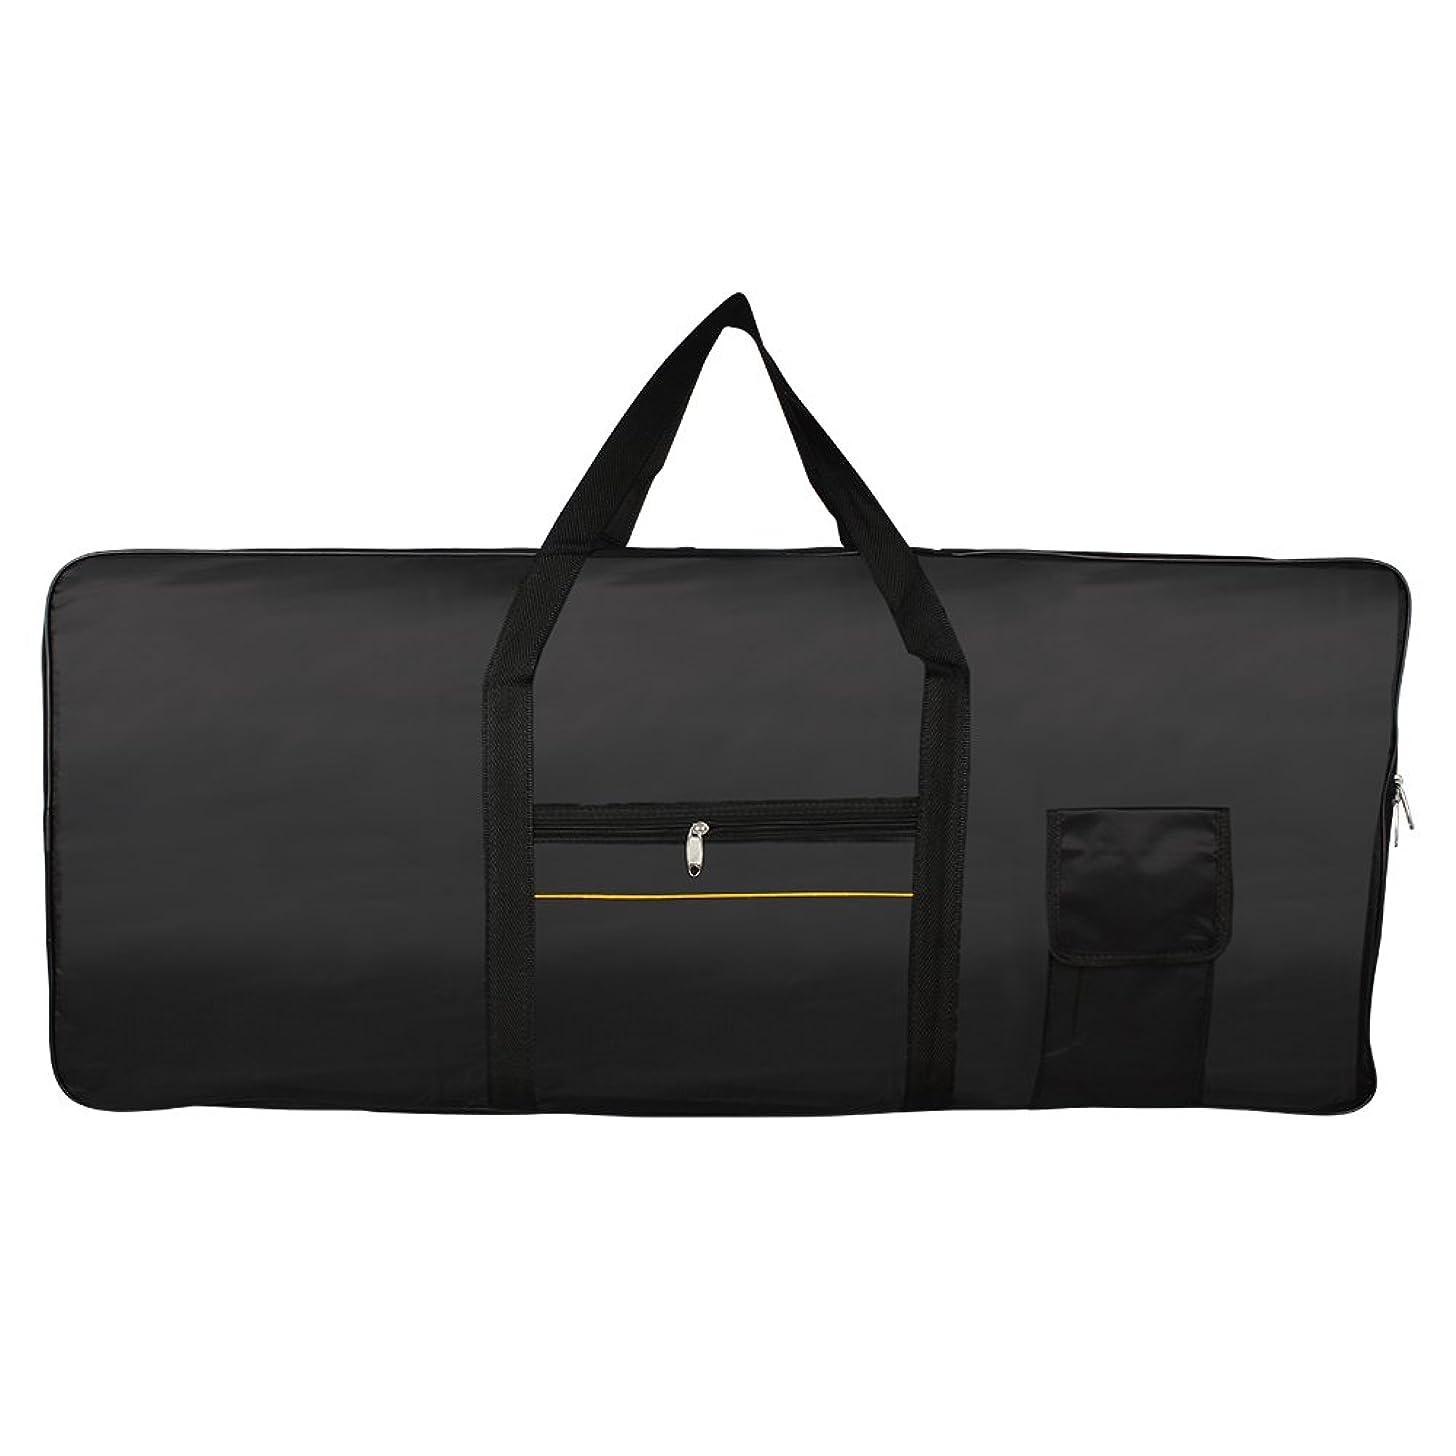 Andoer Portable 61-Key Keyboard Electric Piano Padded Case Gig Bag Oxford Cloth